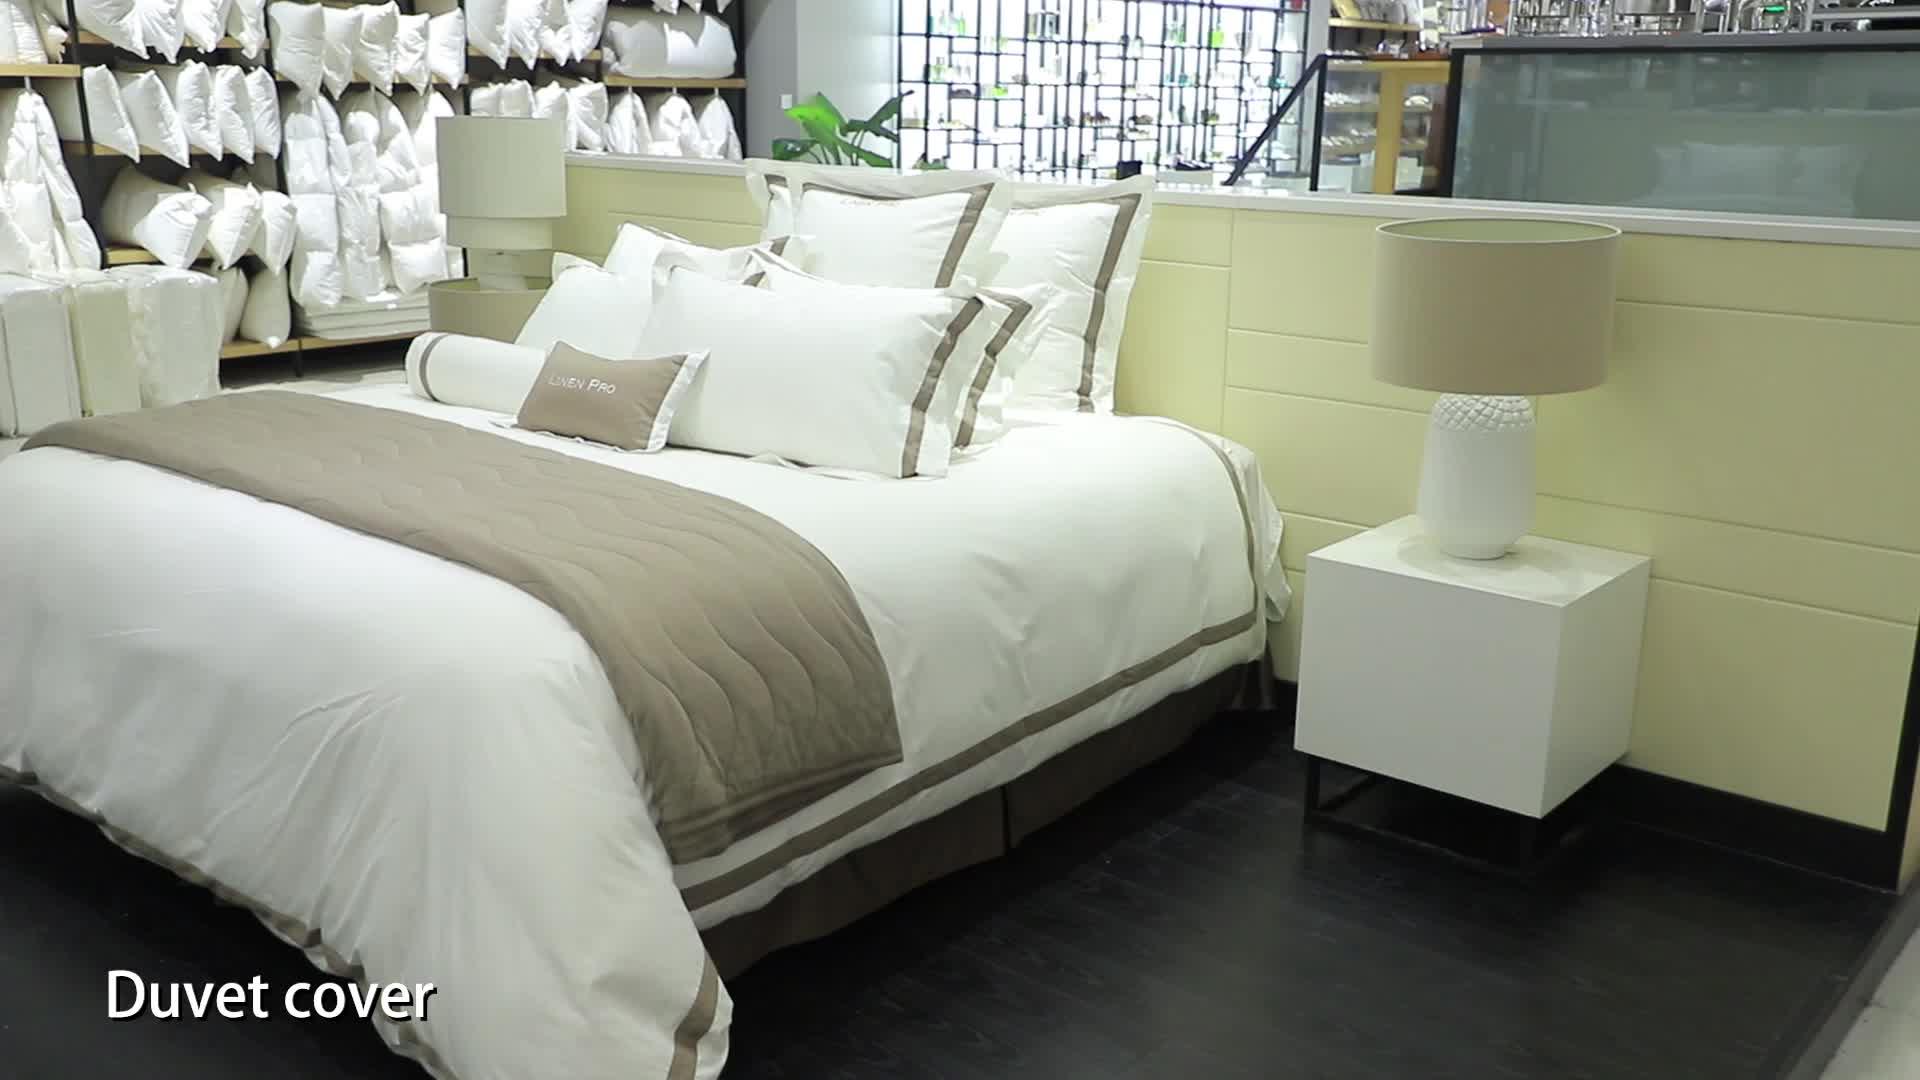 LinenPro  knitted White 100% Pakistan cotton seersucker king hotel life bedding sheet set